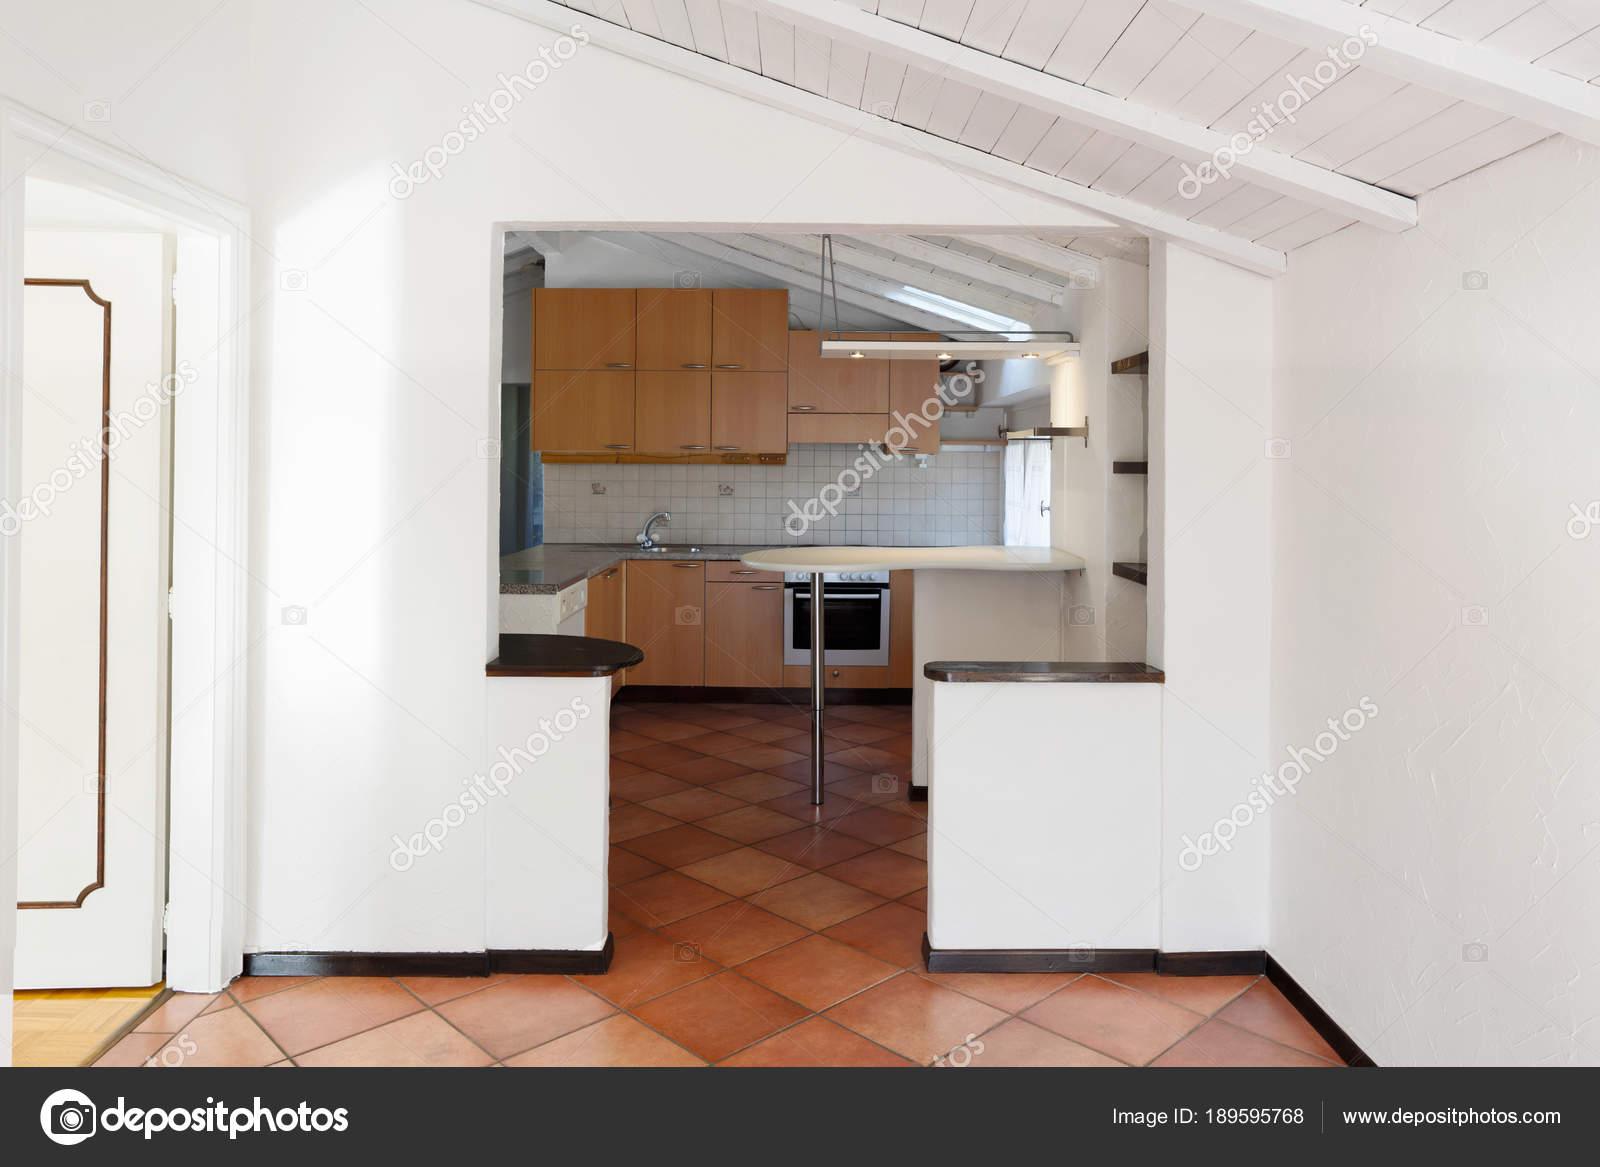 Sgabelli cucina moderni prezzi sgabelli cucina come sceglierli in